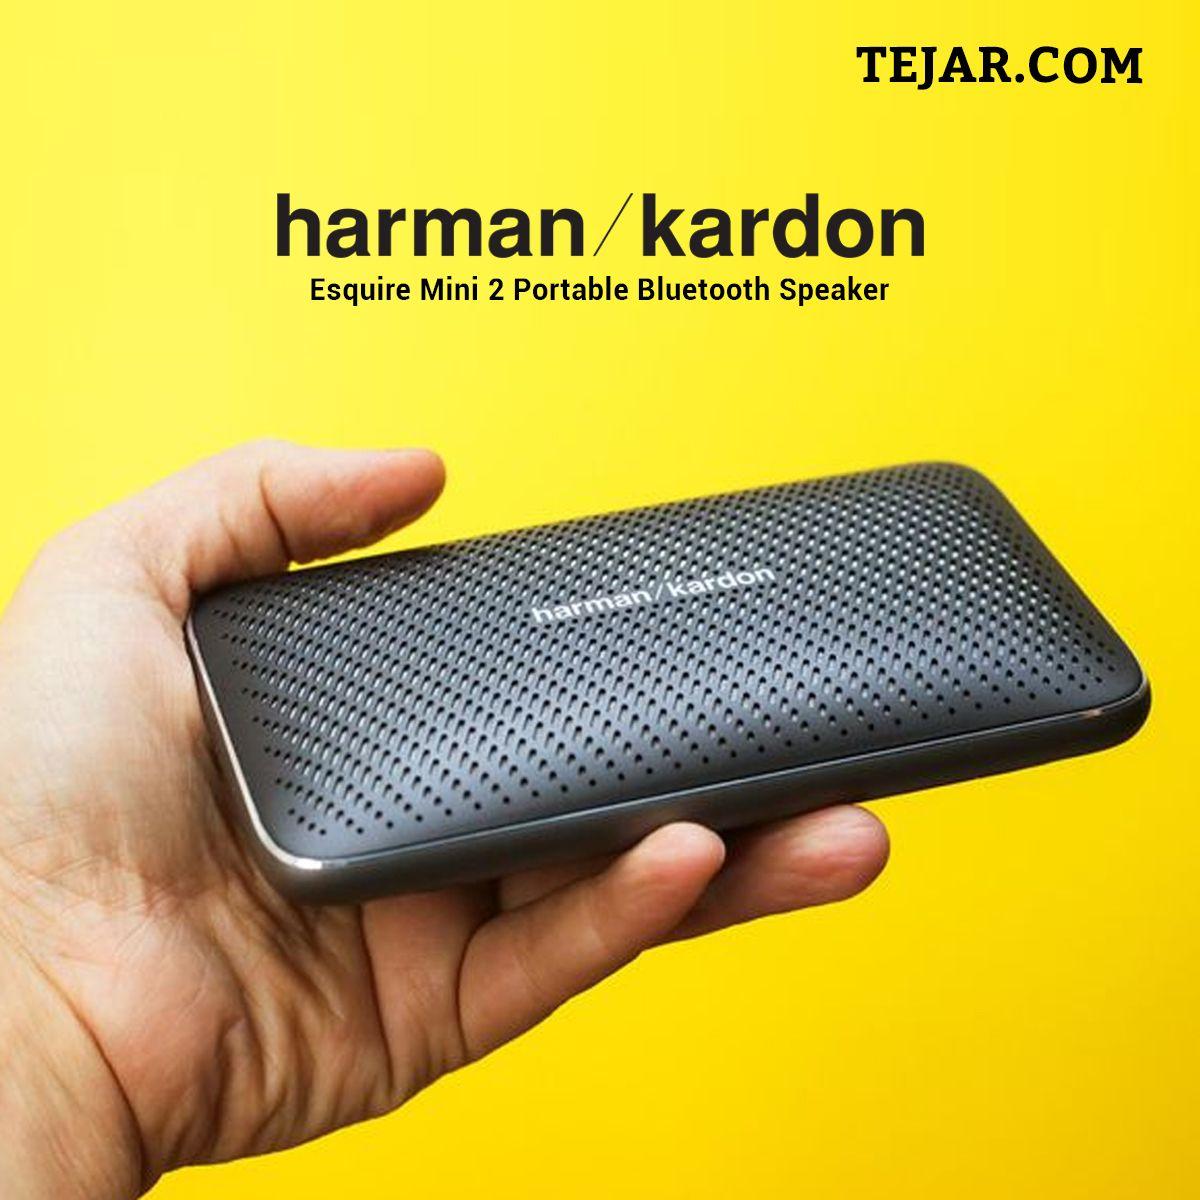 Harman kardon esquire mini 2 portable bluetooth speaker in